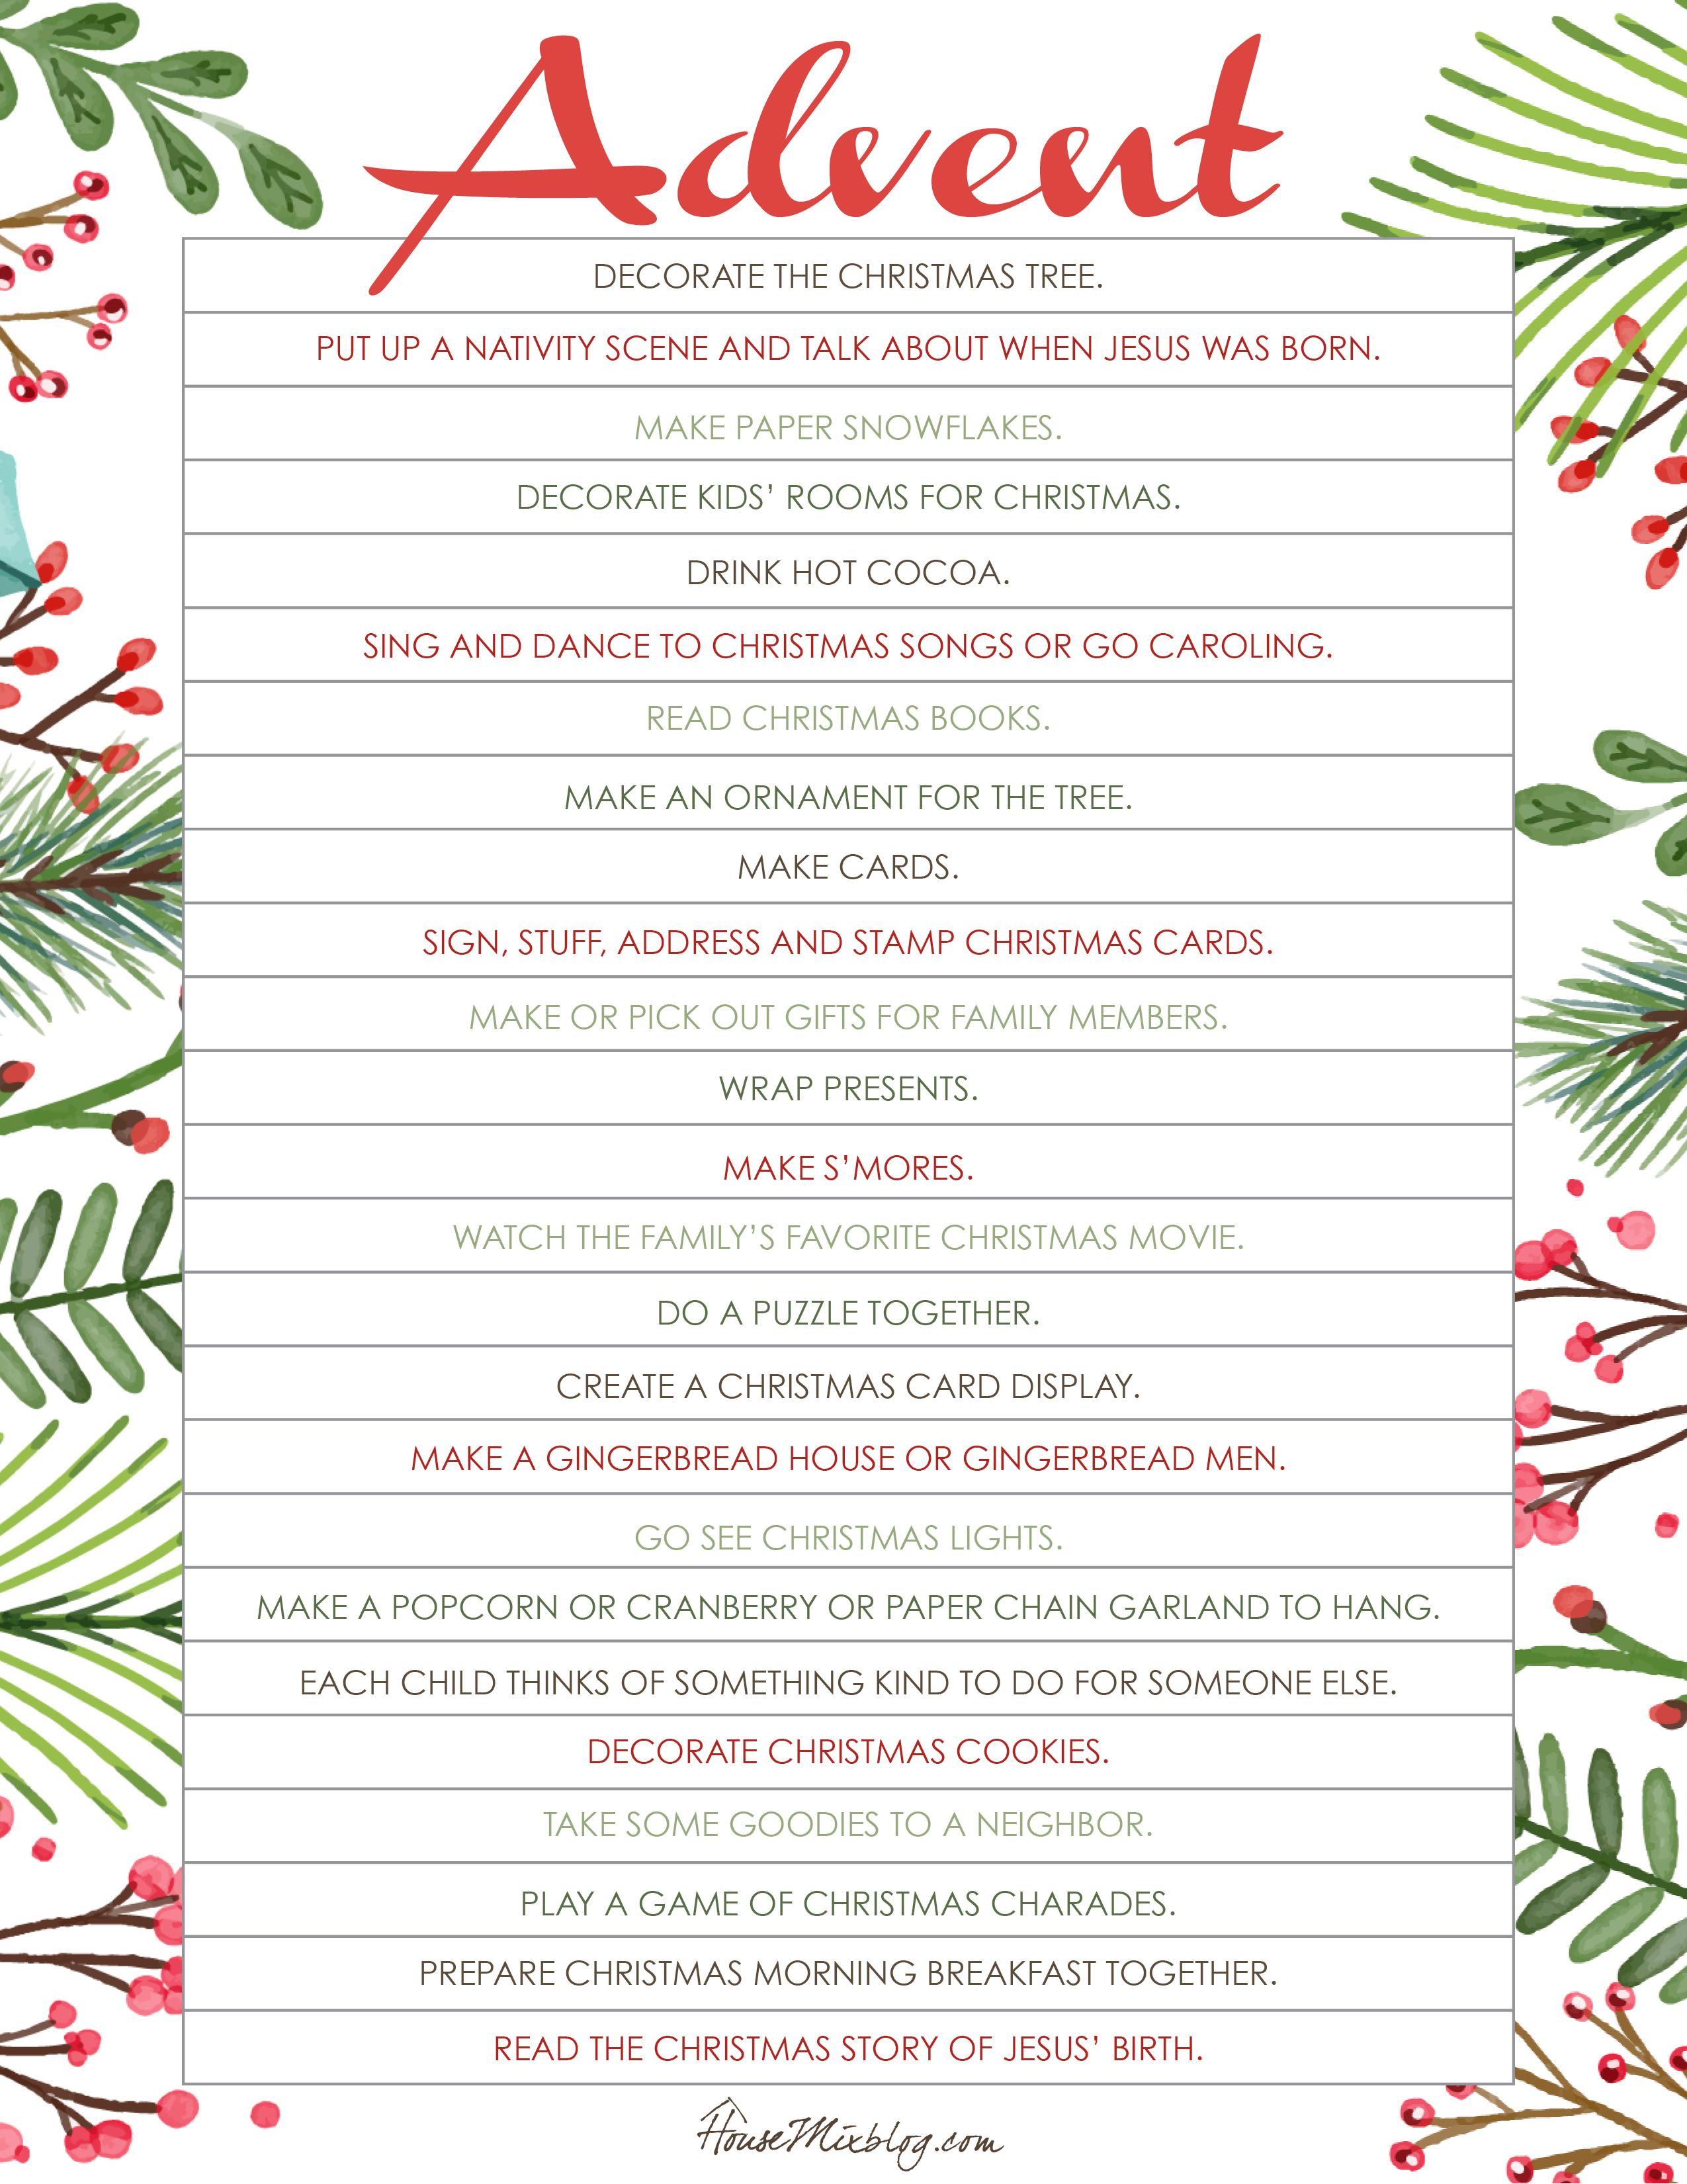 Printable Christmas activities for advent